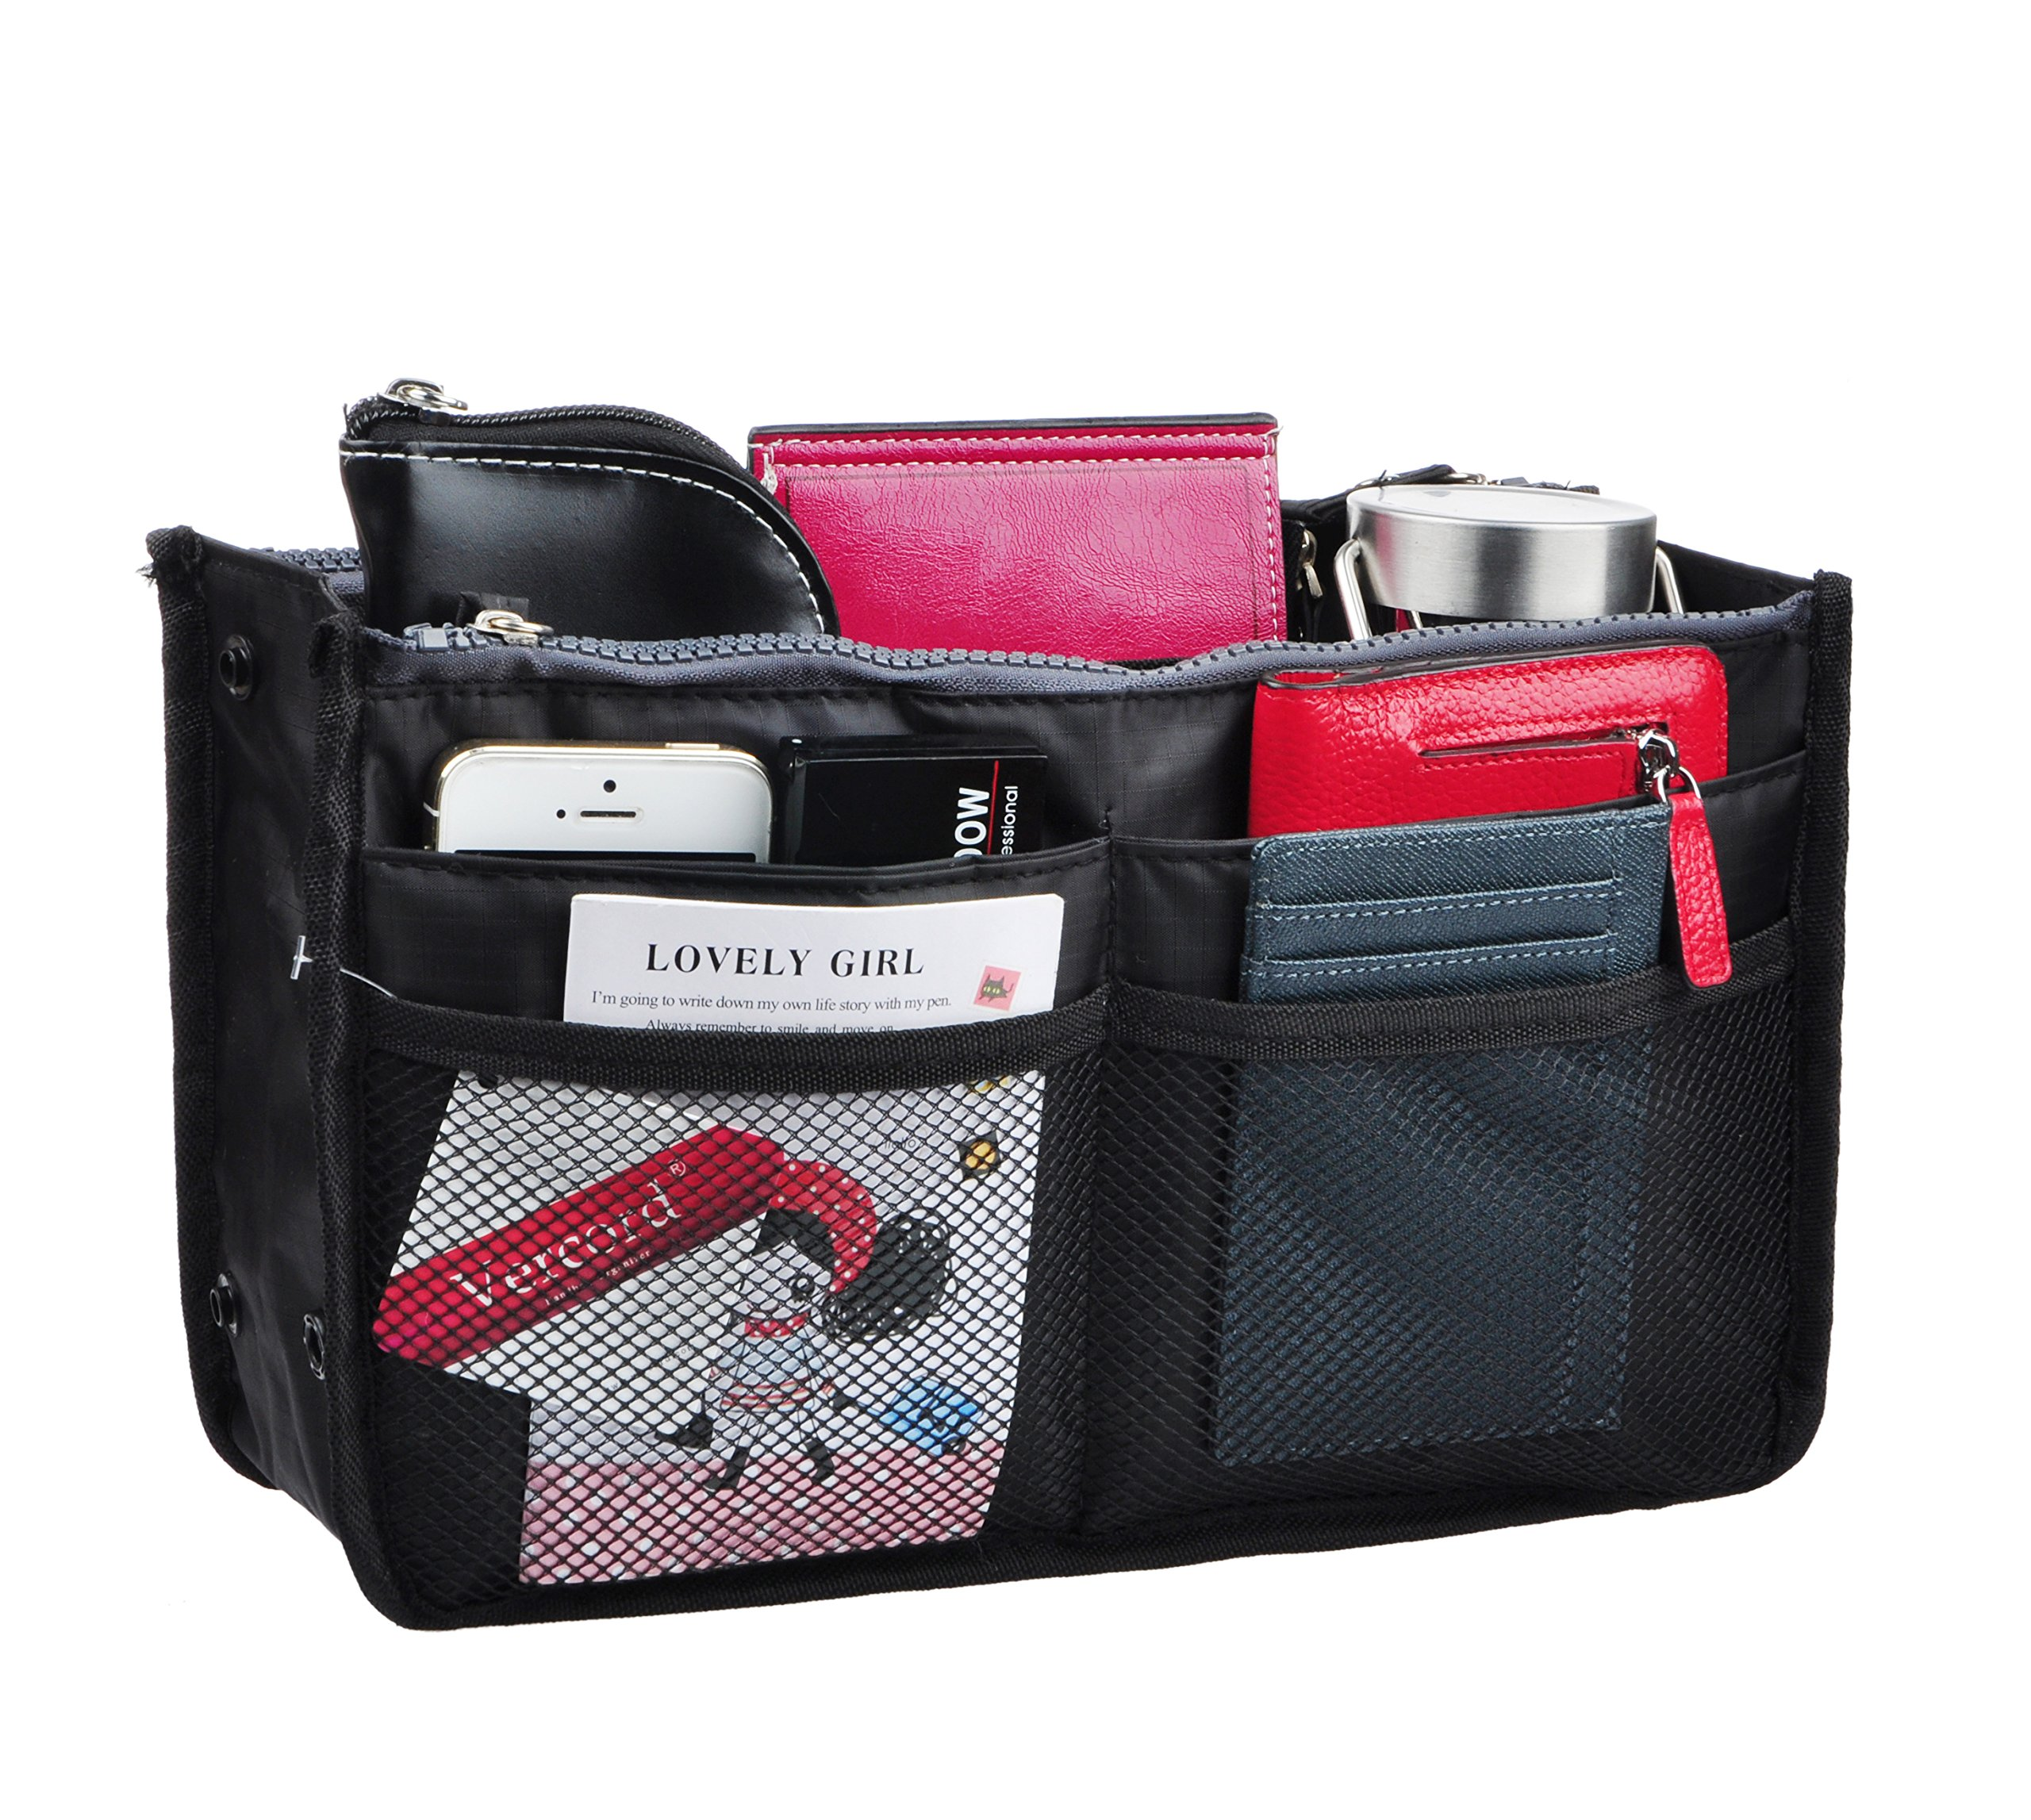 Vercord Updated Purse Handbag Organizer Insert Liner Bag in Bag 13 Pockets 3 Size, Black L